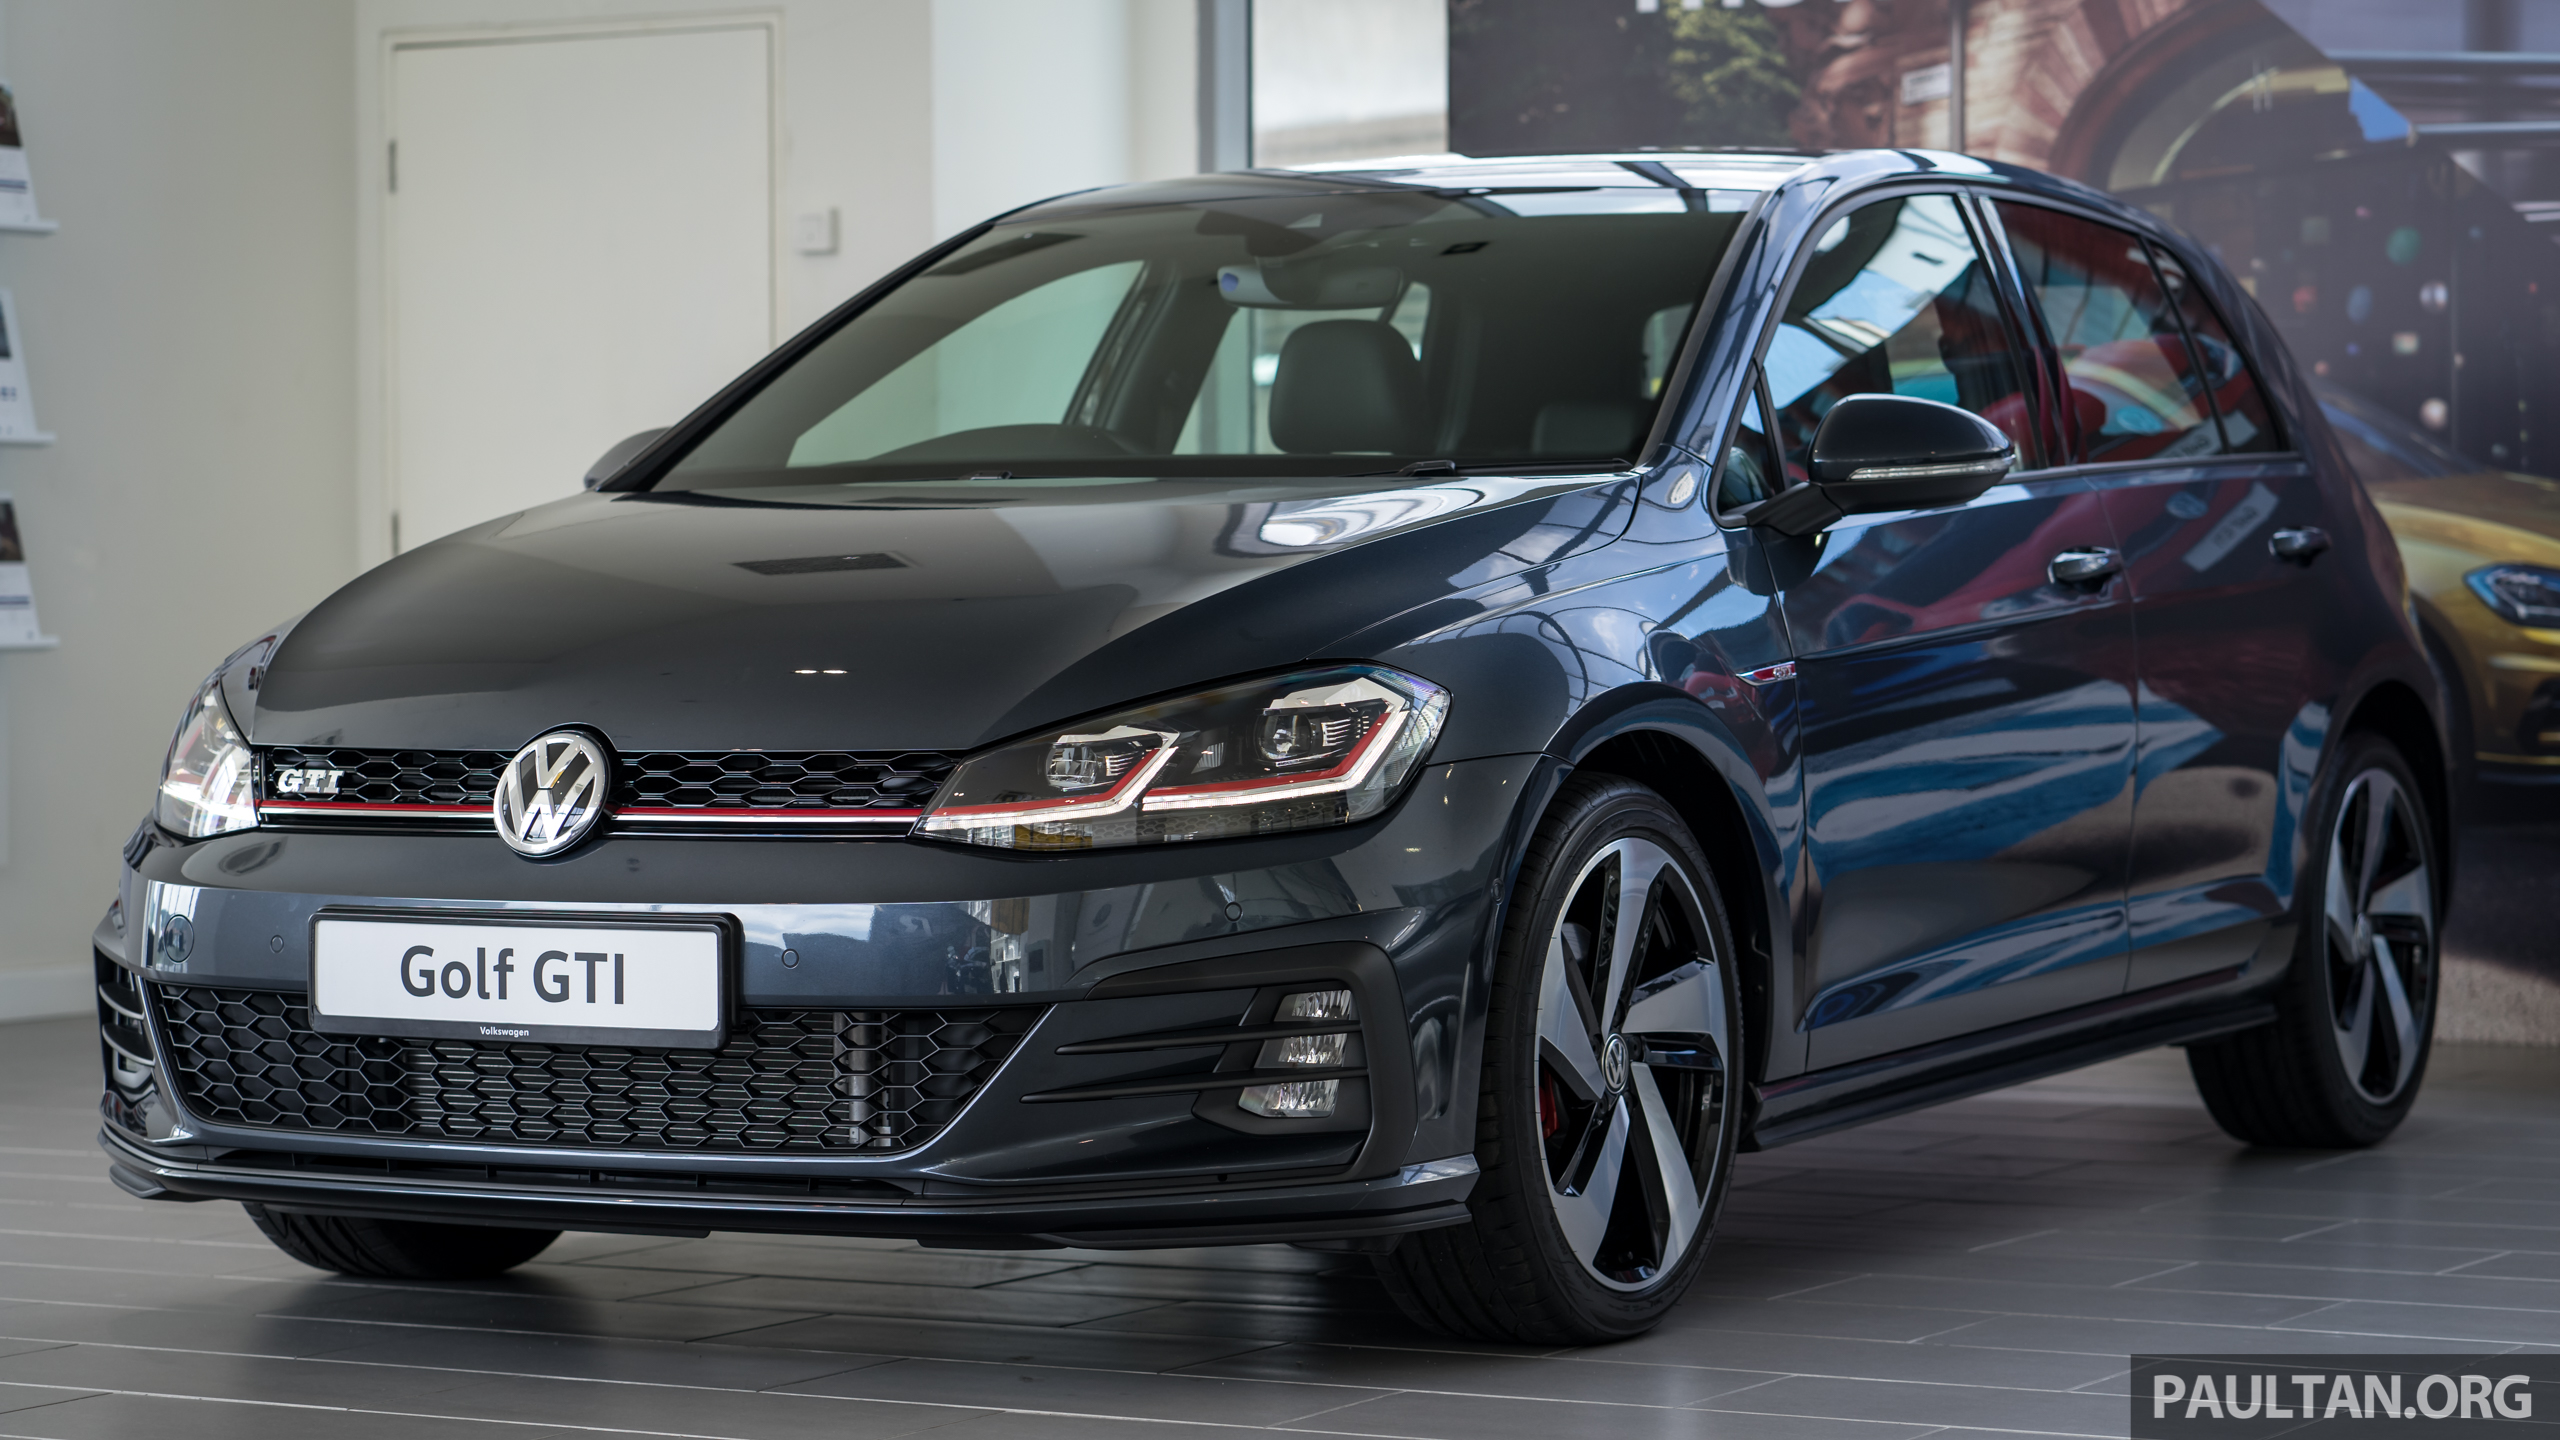 2018 Volkswagen Golf Gti Mk7 5 Launch In Malaysia Paul Tan Image